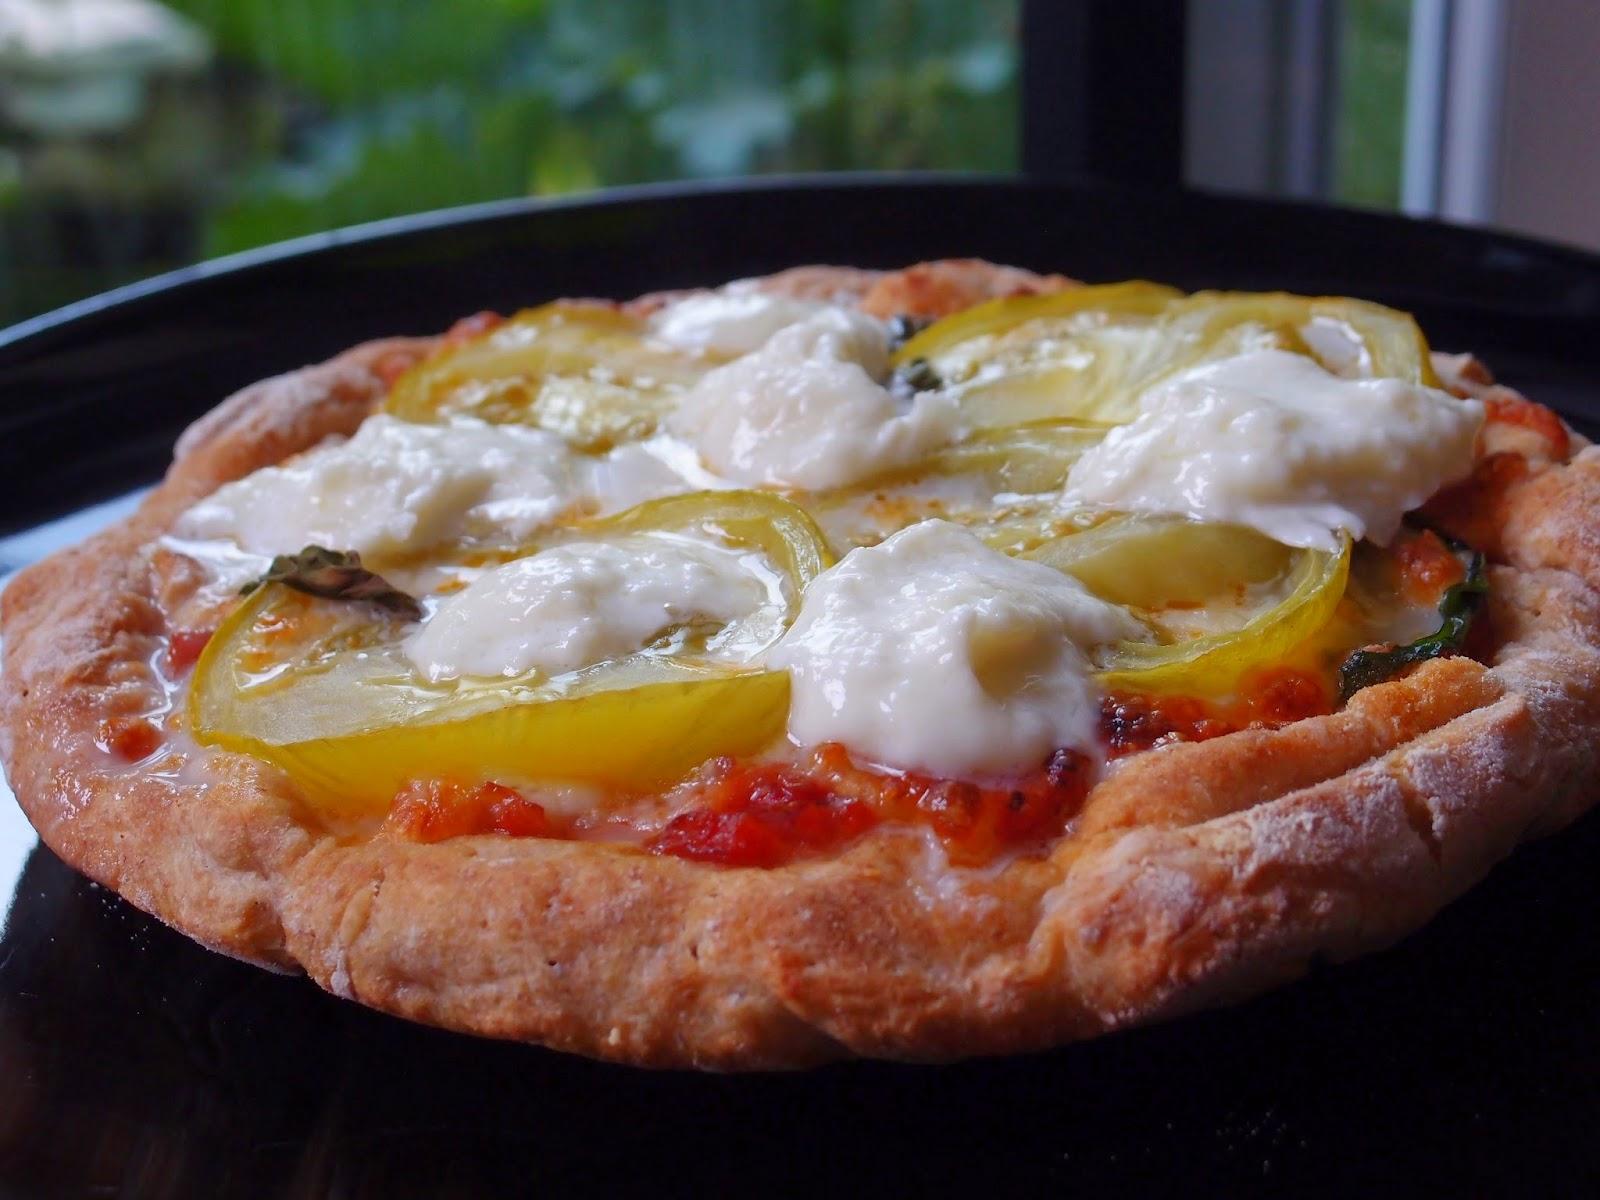 The VegHog: Fried heirloom tomato pizza